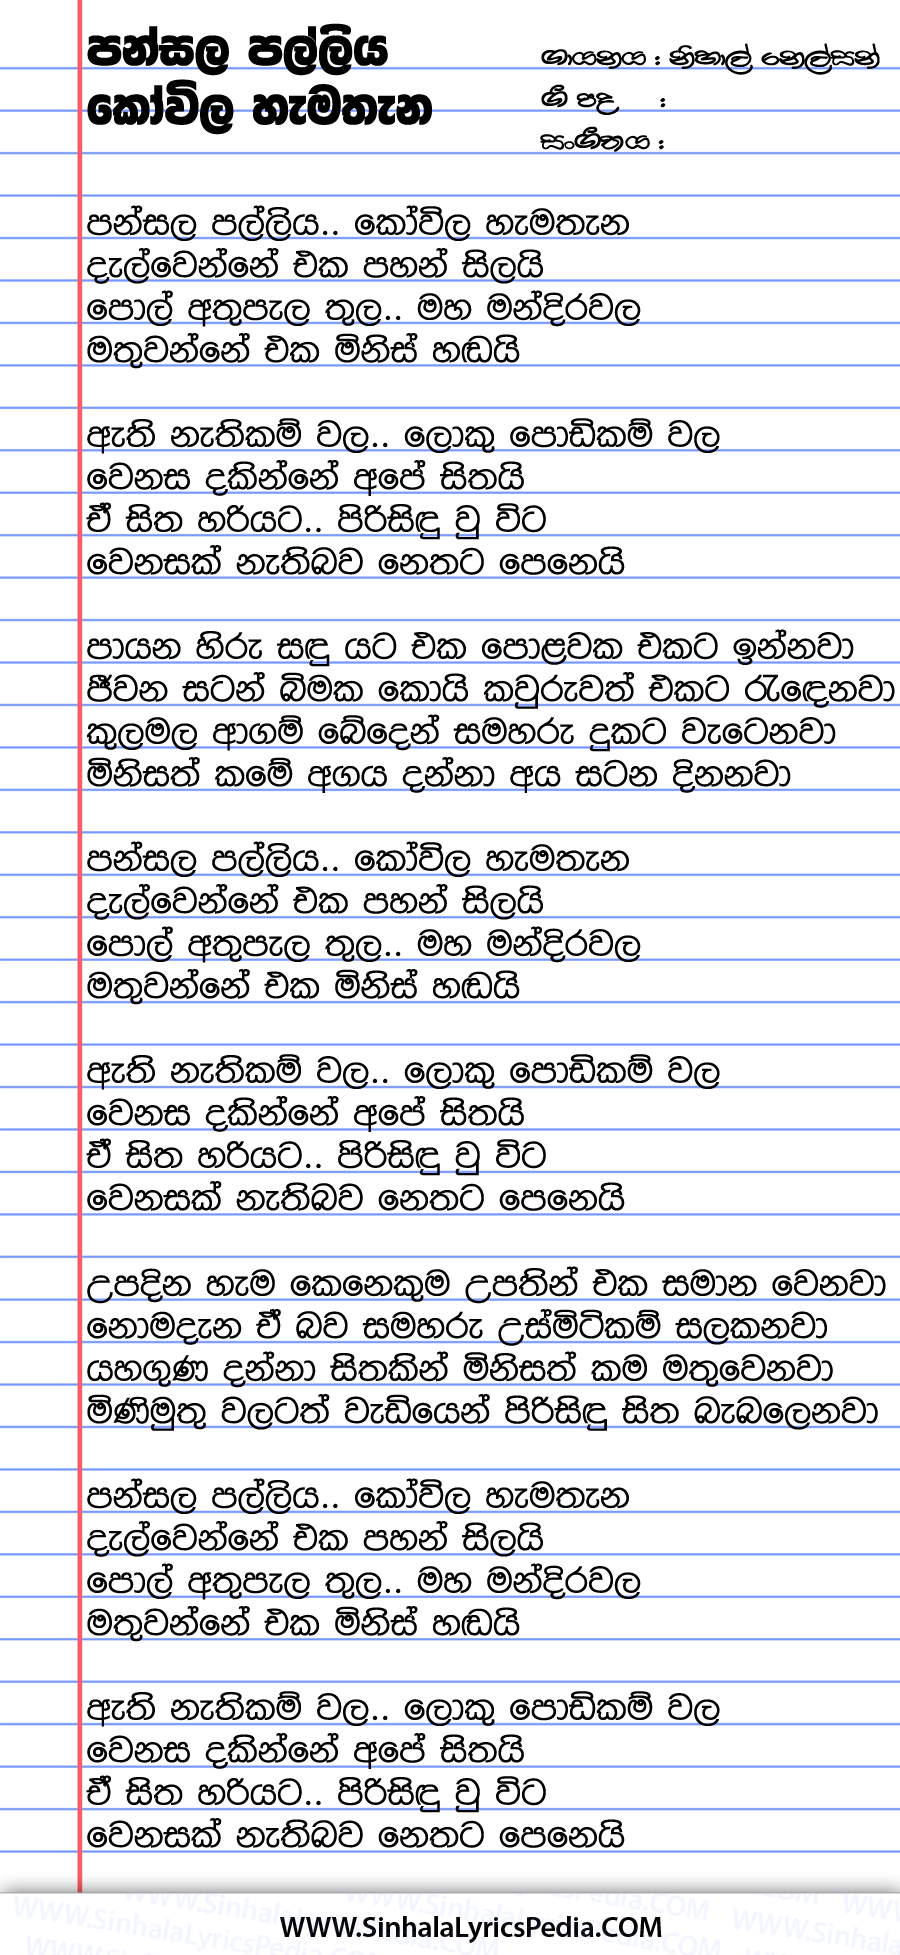 Pansala Palliya Kovila Song Lyrics